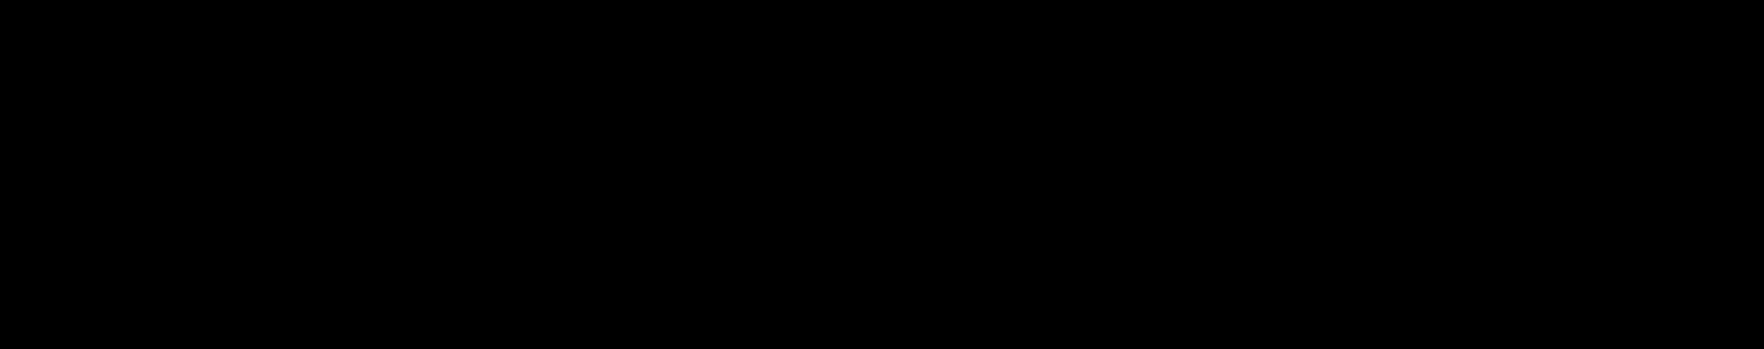 CO2018